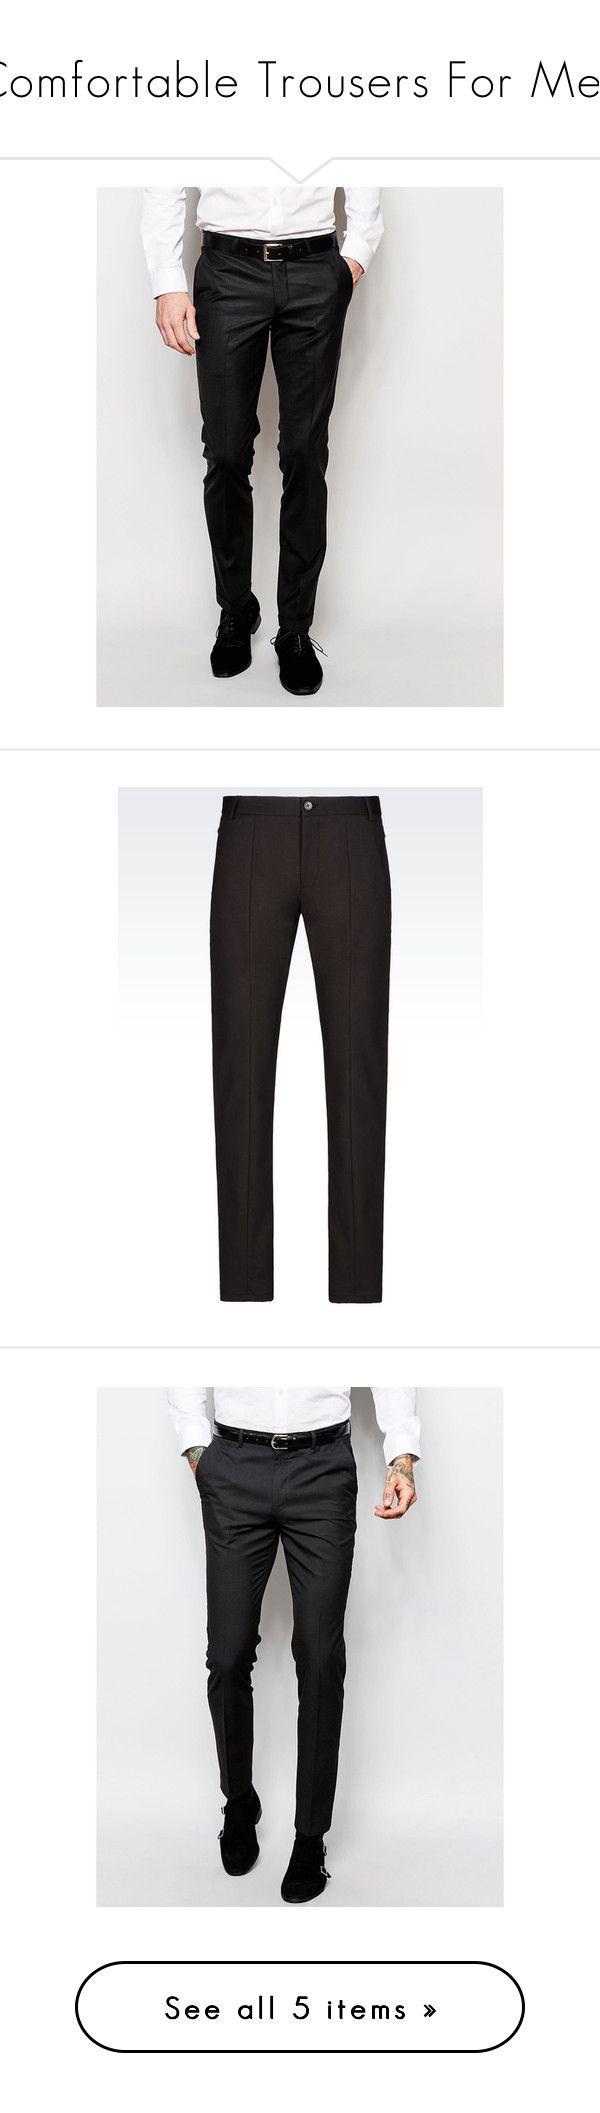 """Comfortable Trousers For Men"" by kirangranite on Polyvore featuring men's fashion, men's clothing, men's pants, men's dress pants, men, pants, black, mens skinny fit dress pants, mens pants and tall mens dress pants"